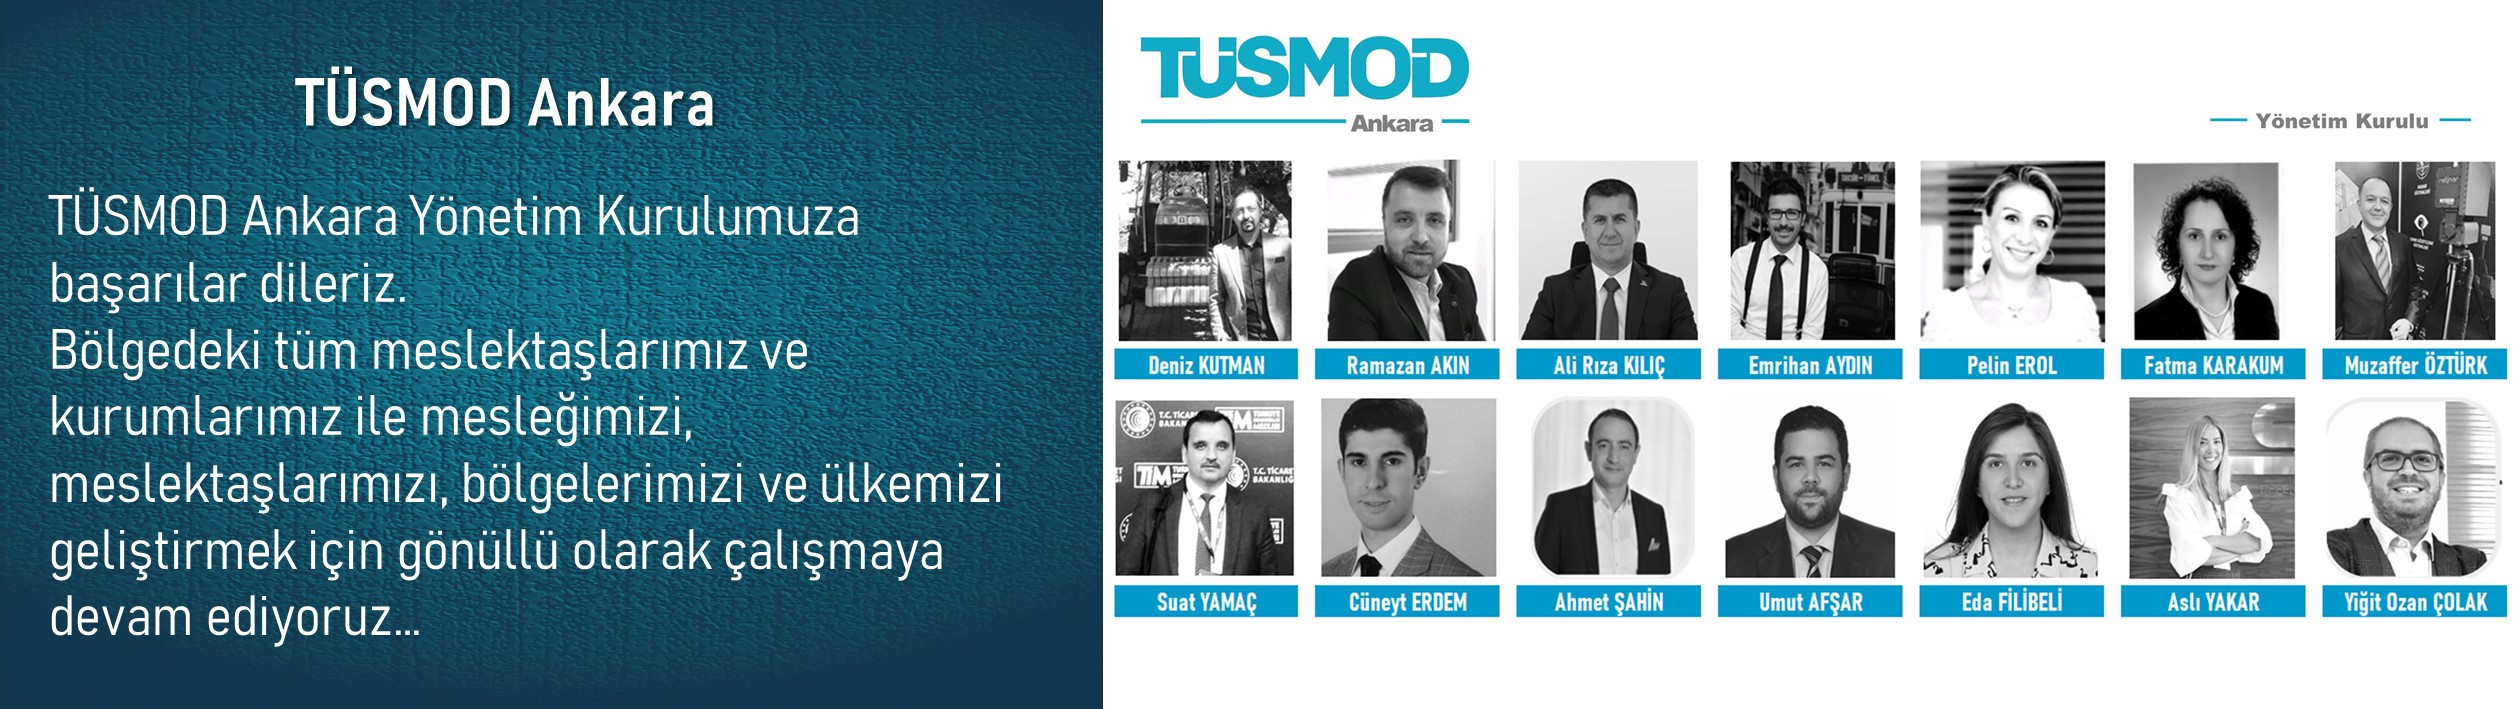 TÜSMOD Ankara